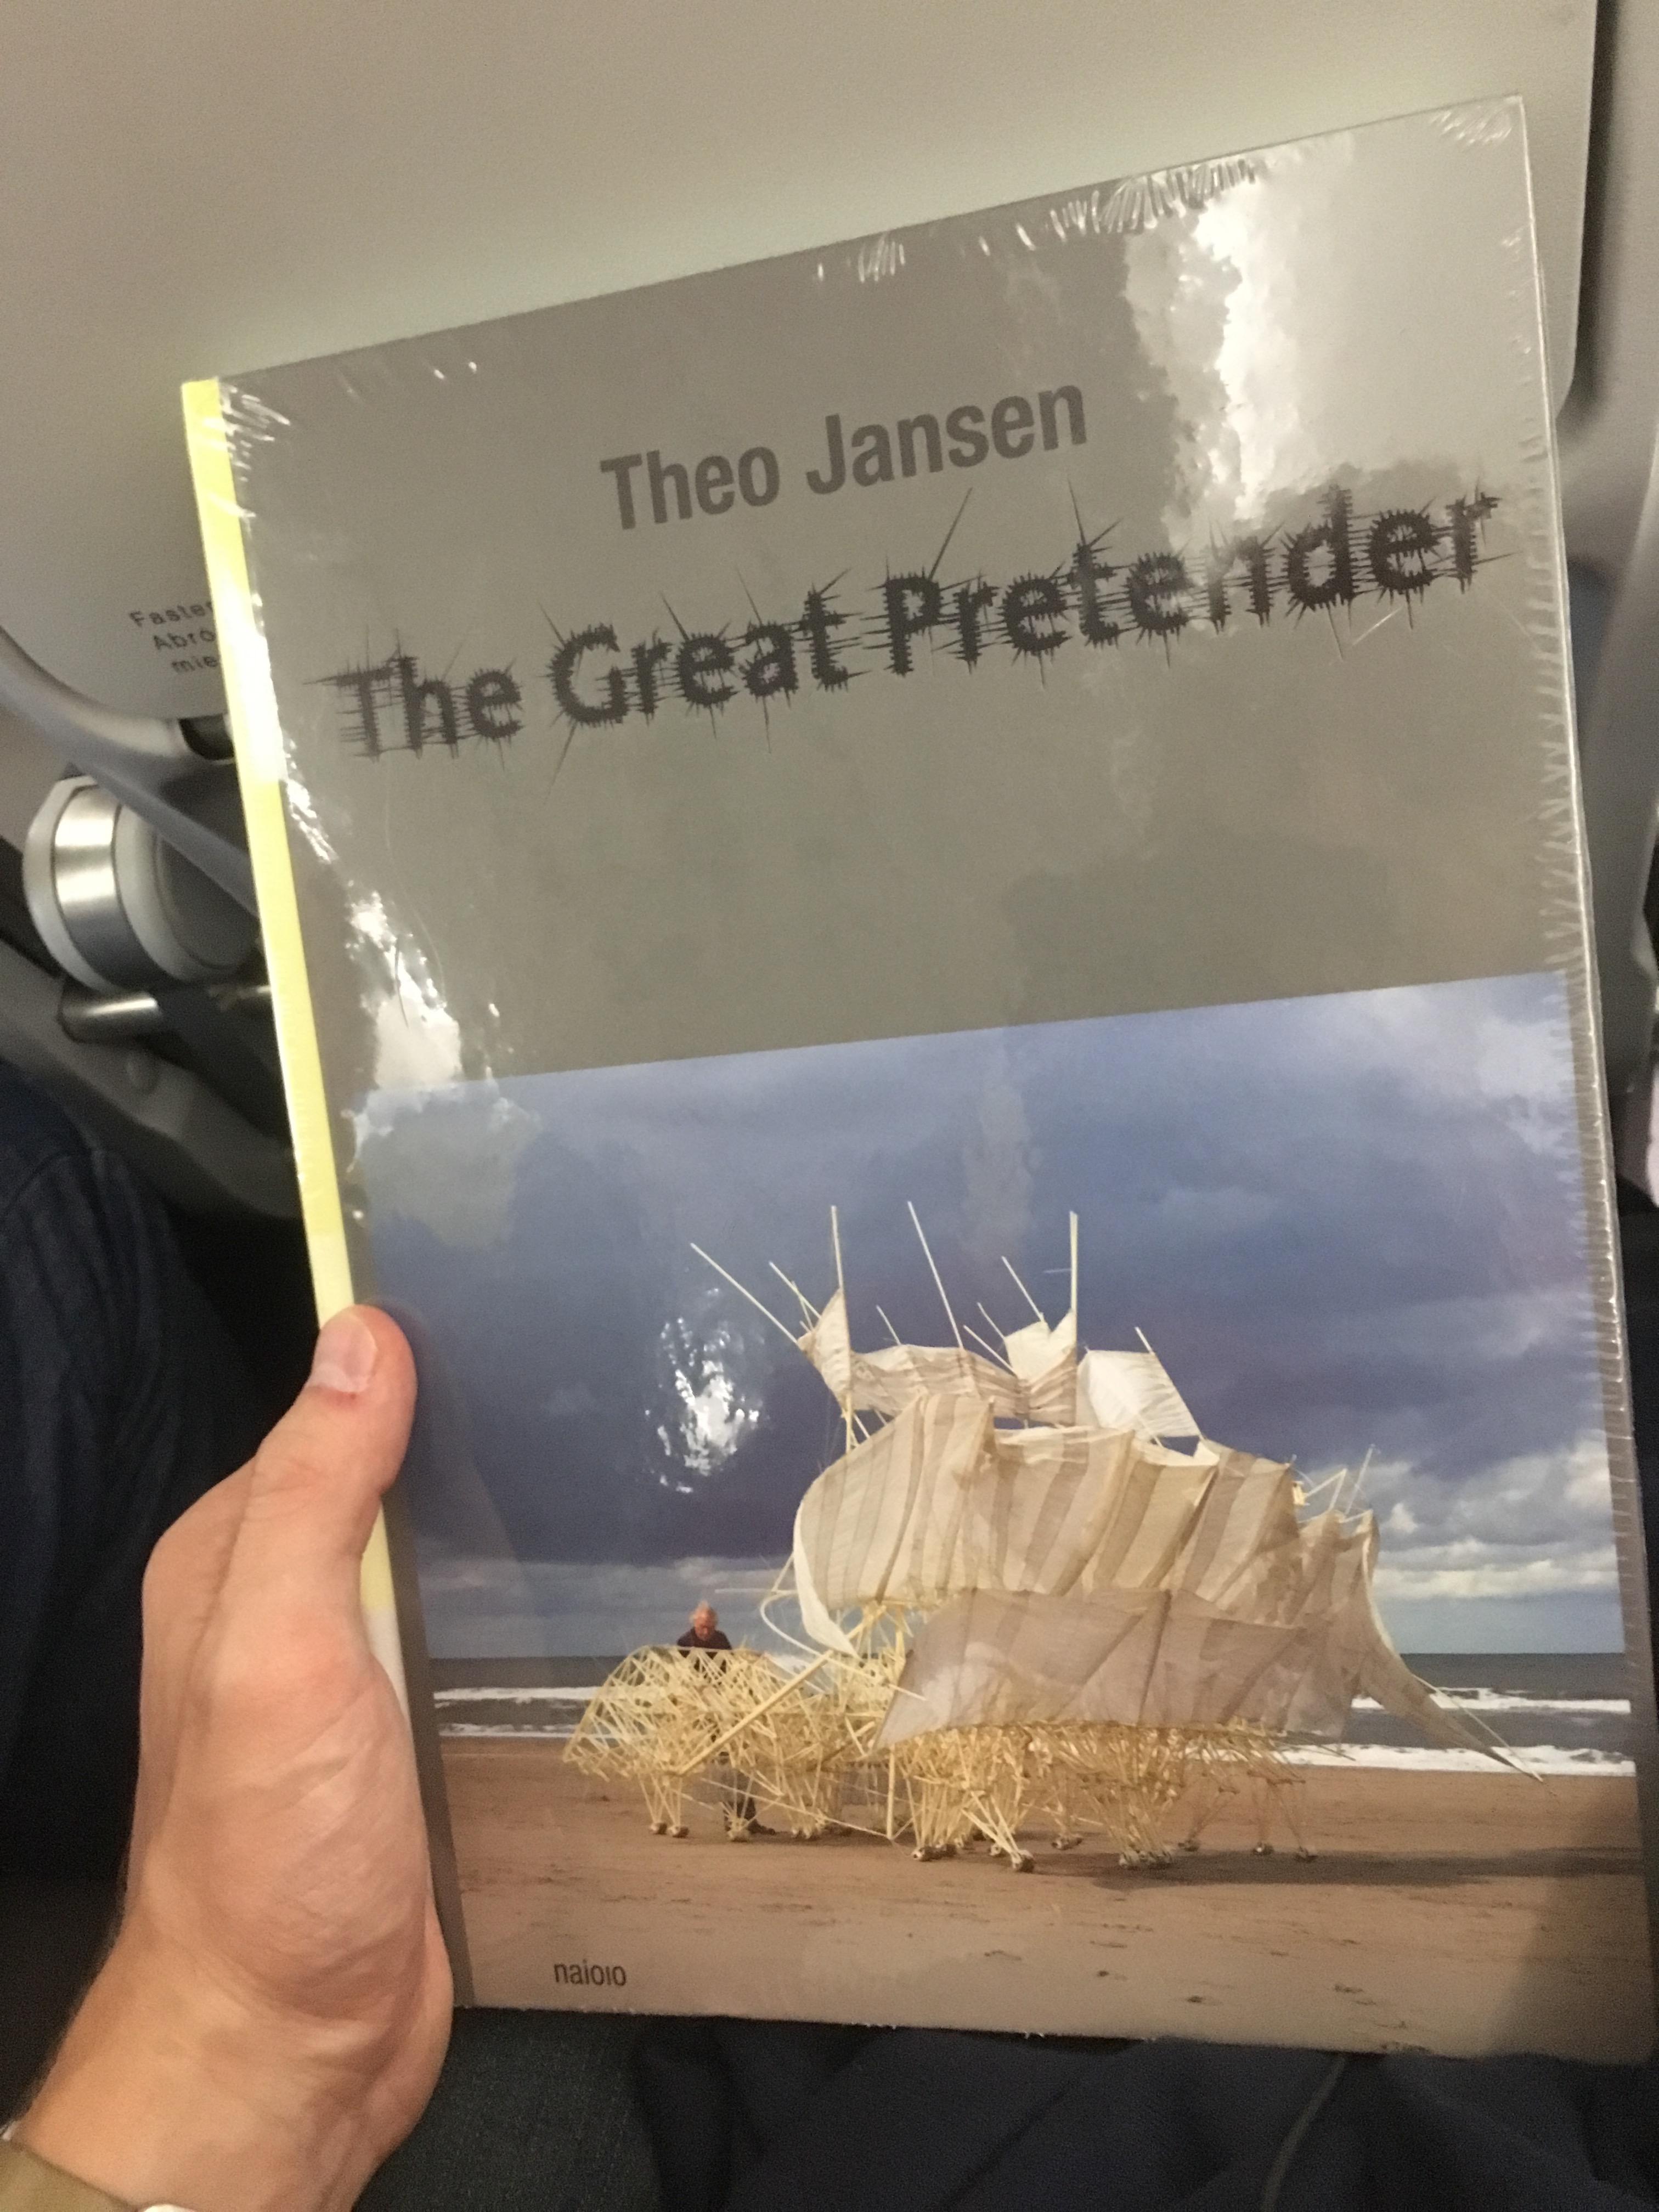 The great pretender by Theo Jansen